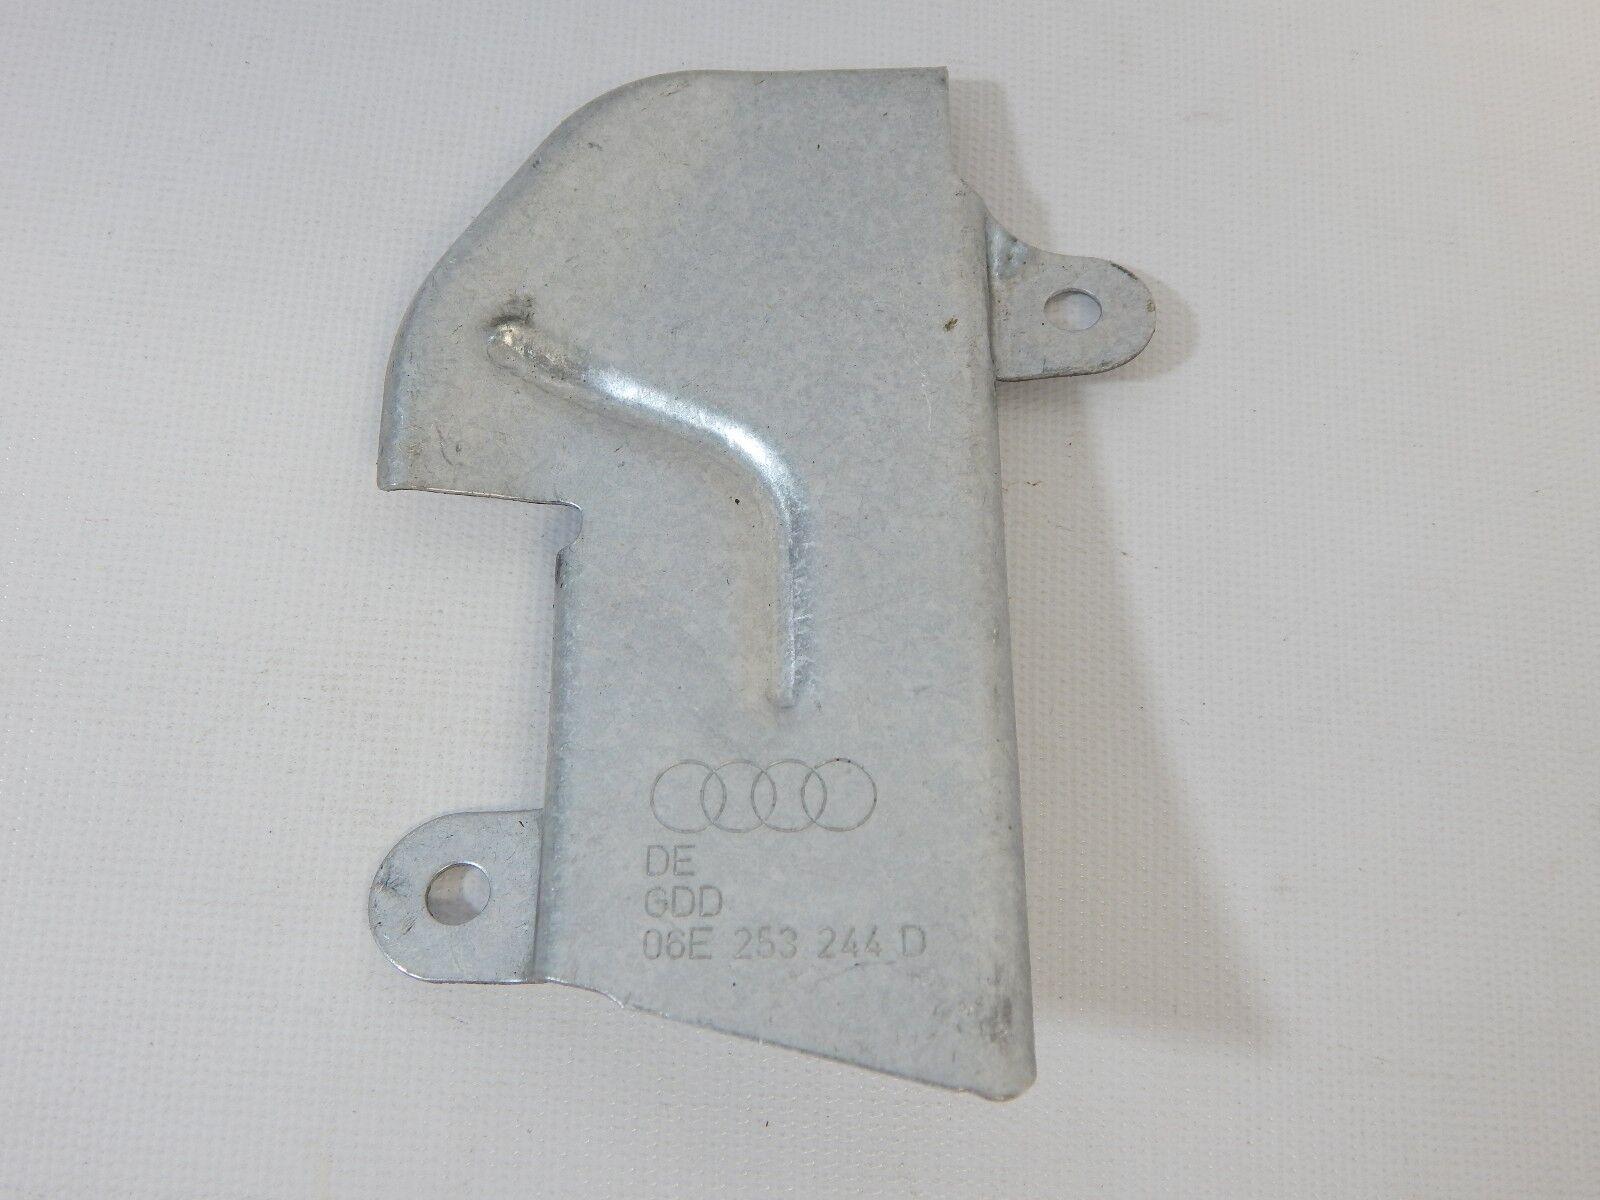 New OEM 2005-2009 Audi 3.2L A4 Exhaust Manifold Corner Heat Shield Cover